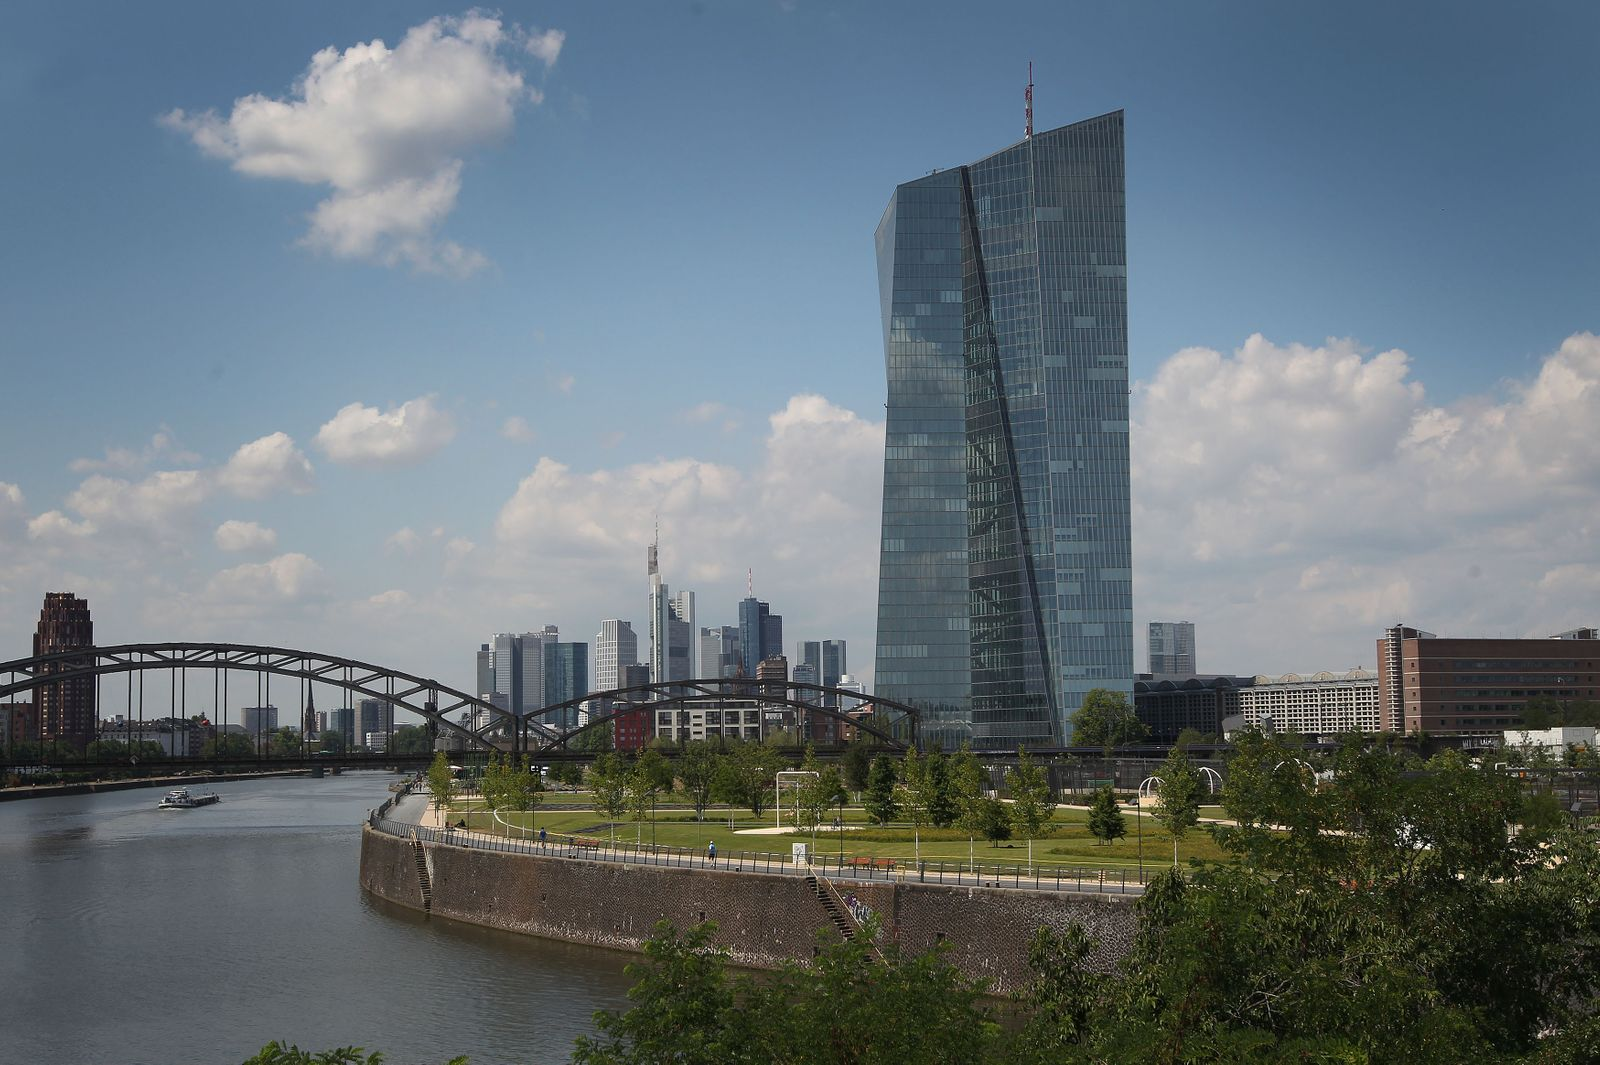 EZB / Europäische Zentralbank